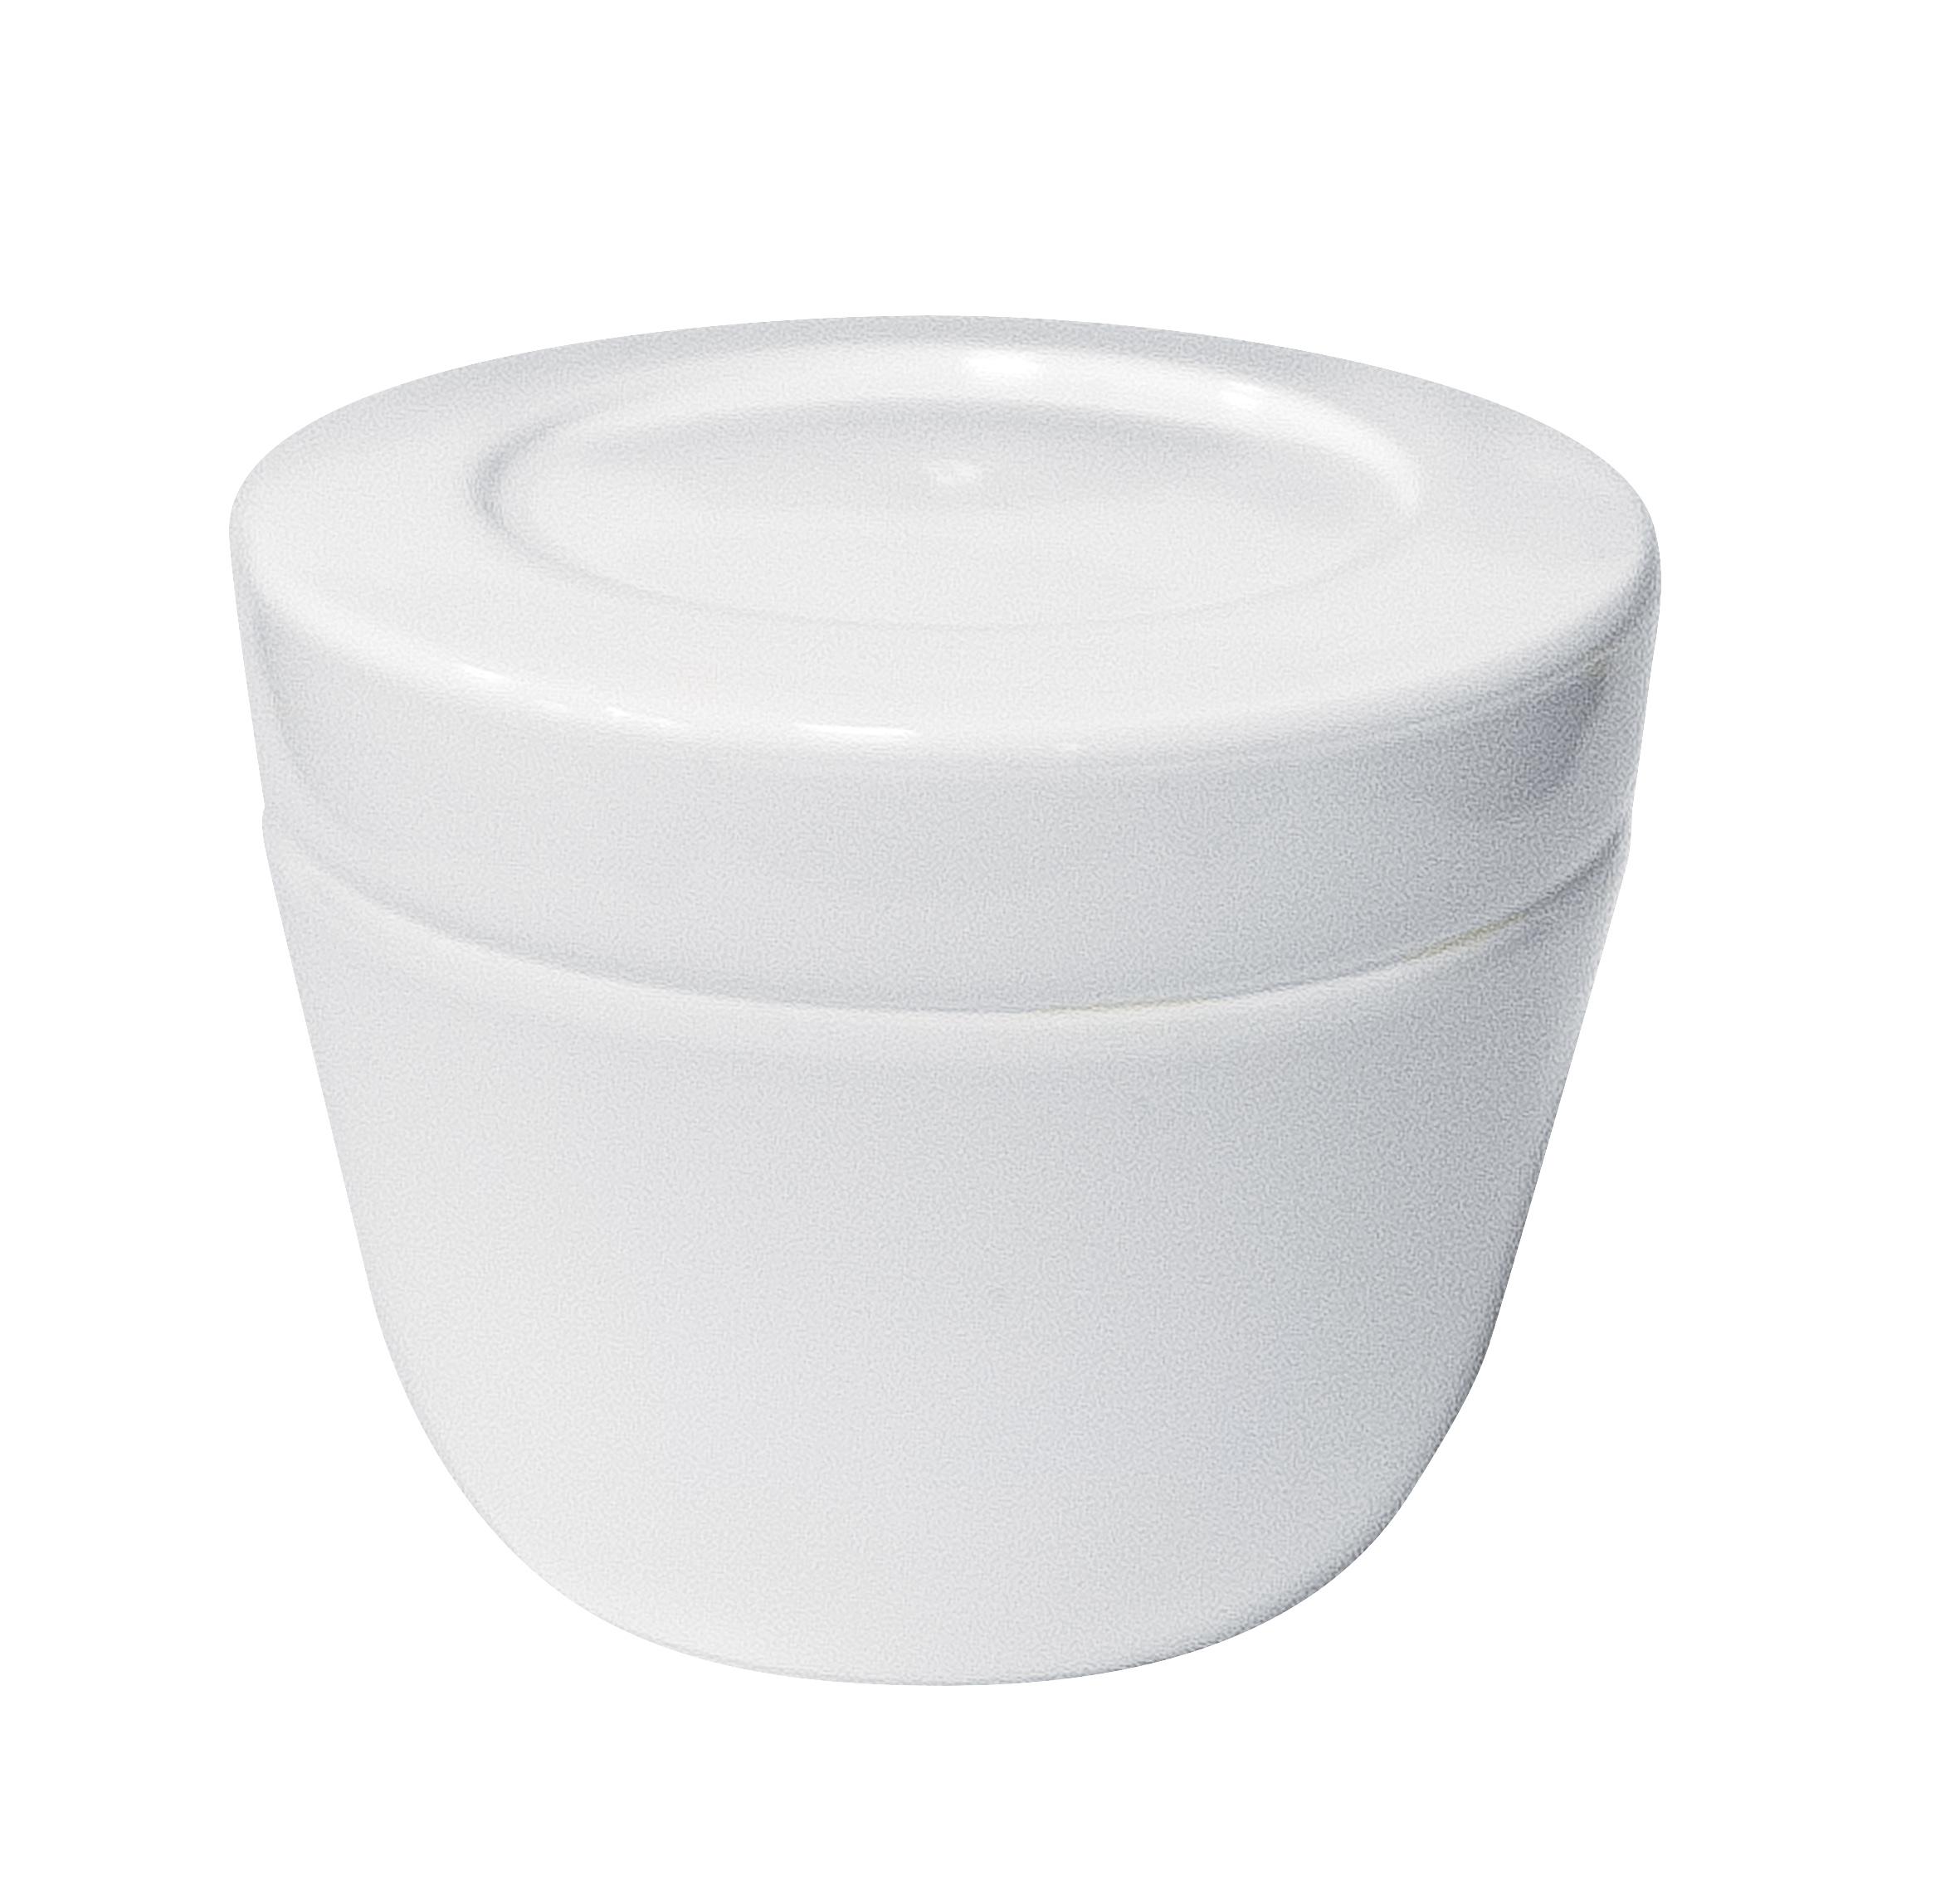 Tarro plástico 50g 13-50 1A